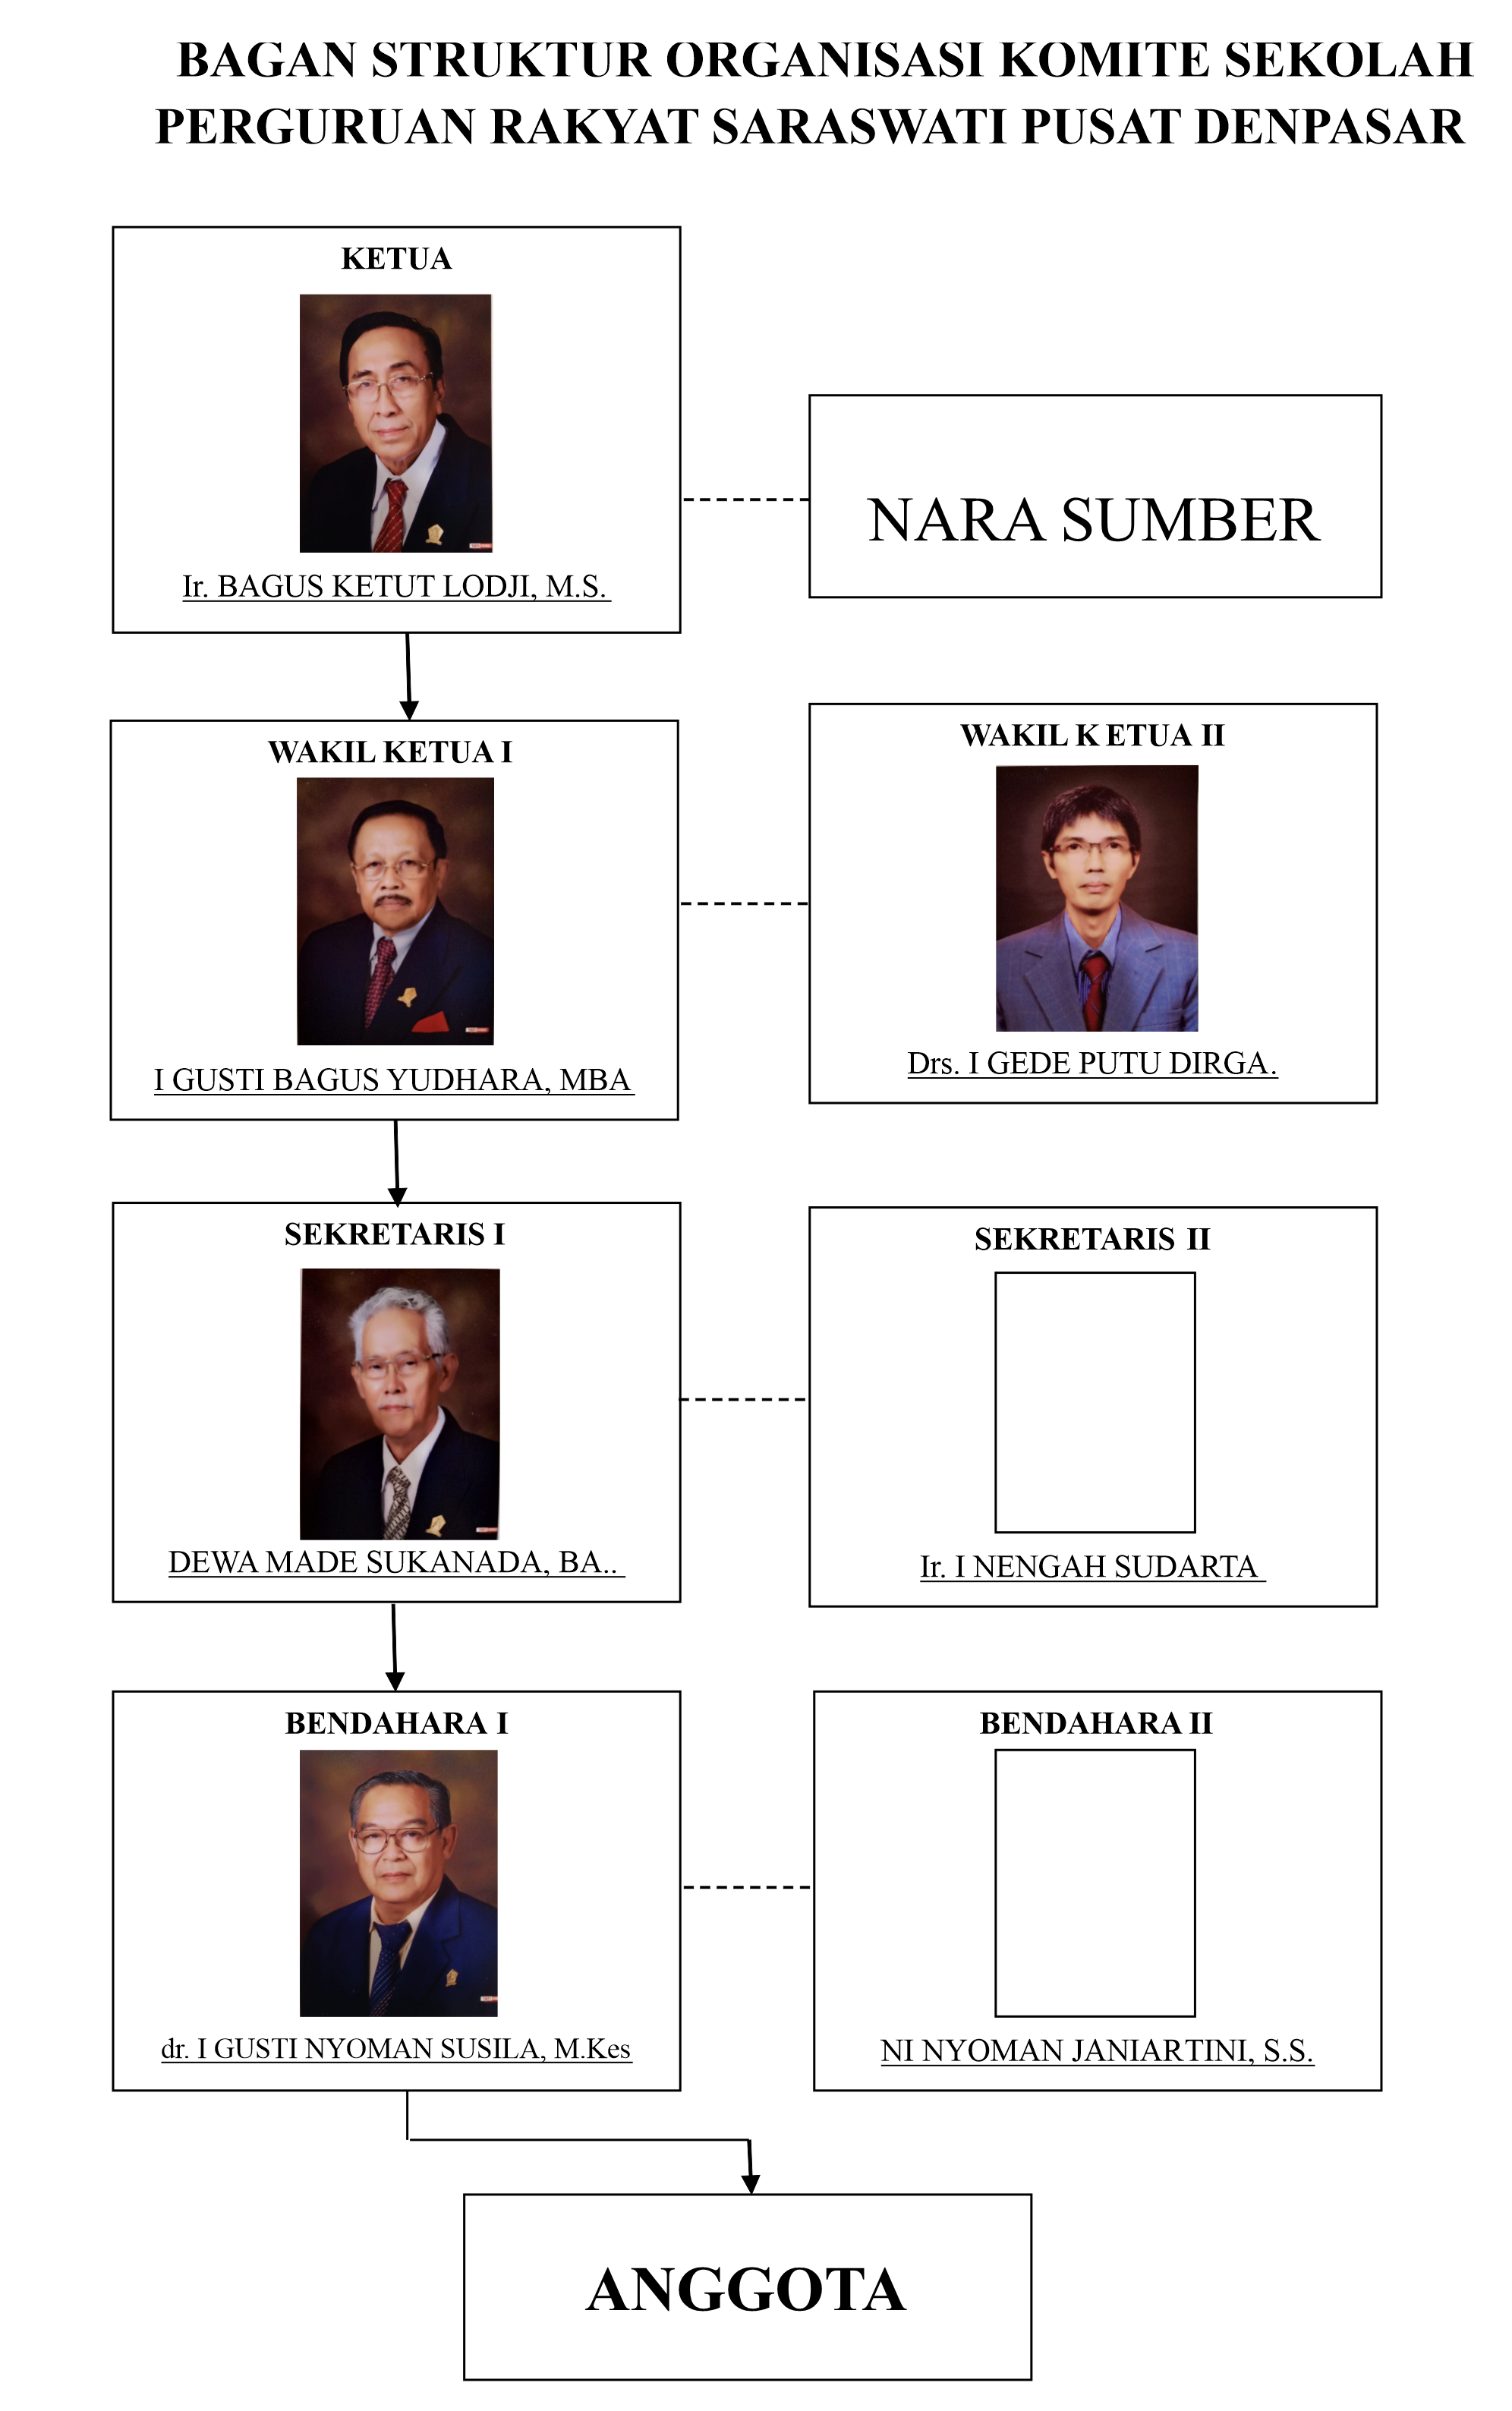 Struktur komite sekolah